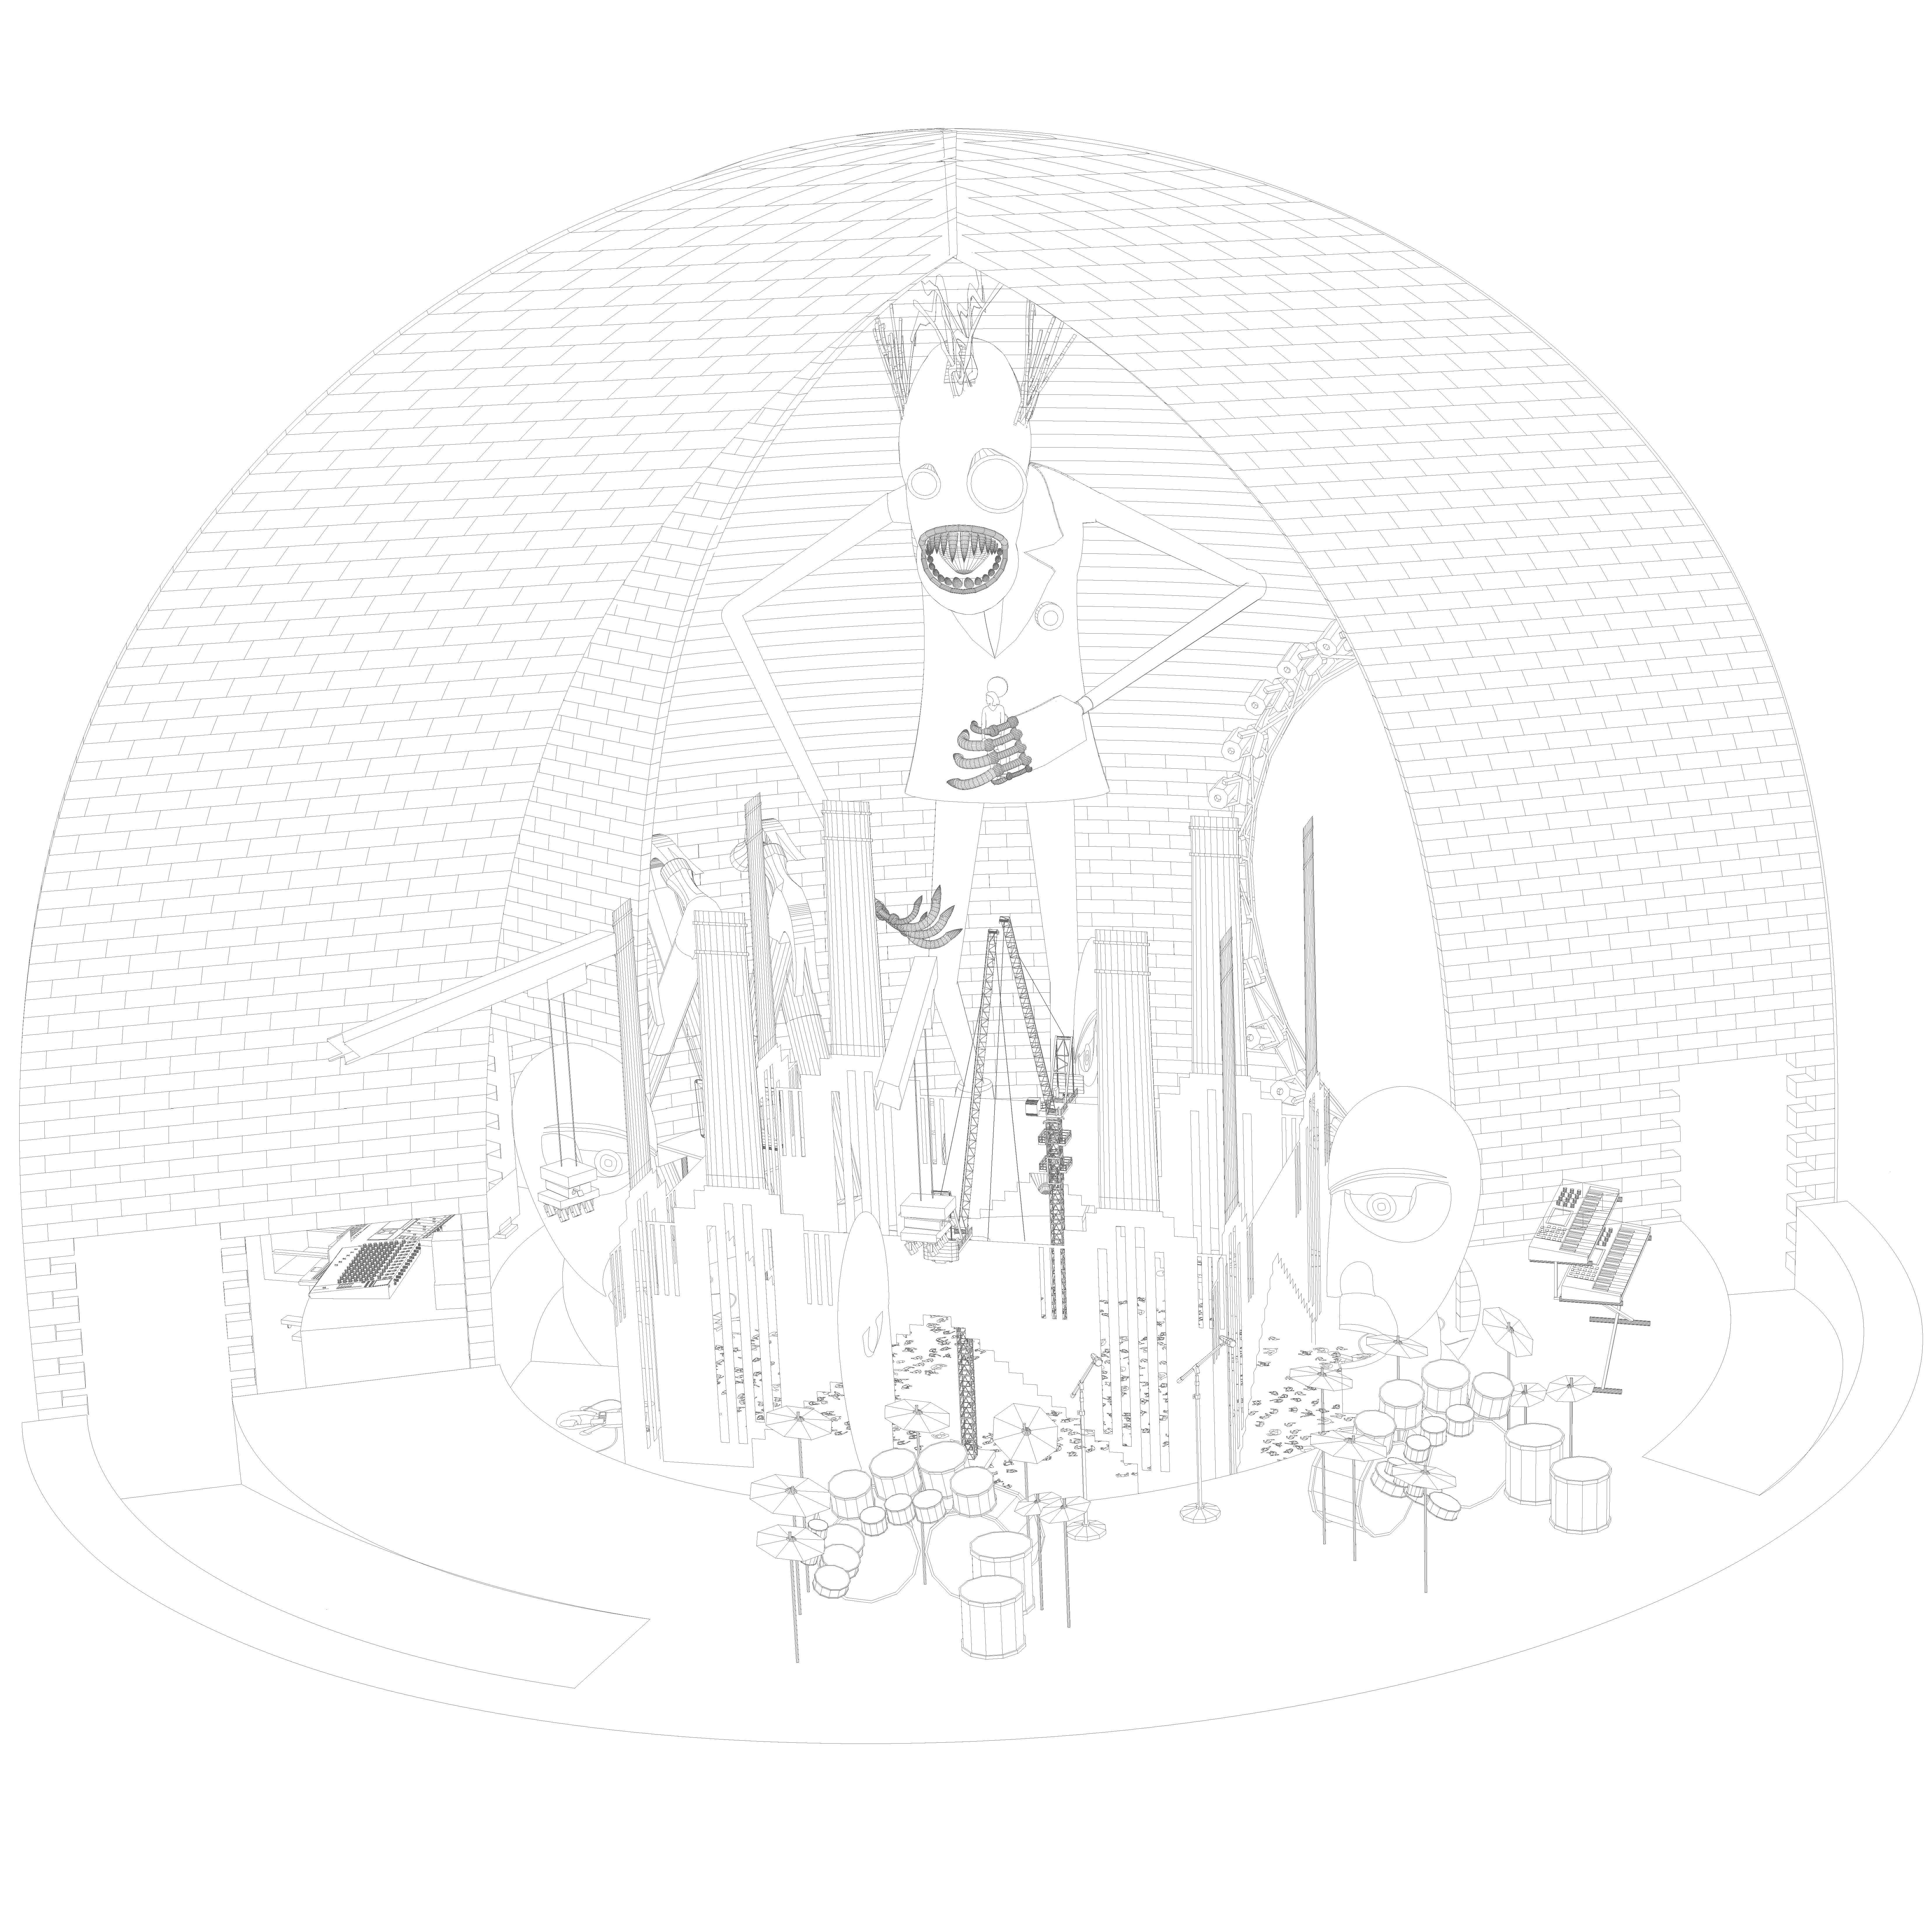 INTERIOR PINK FLOYD 2 [Converted]